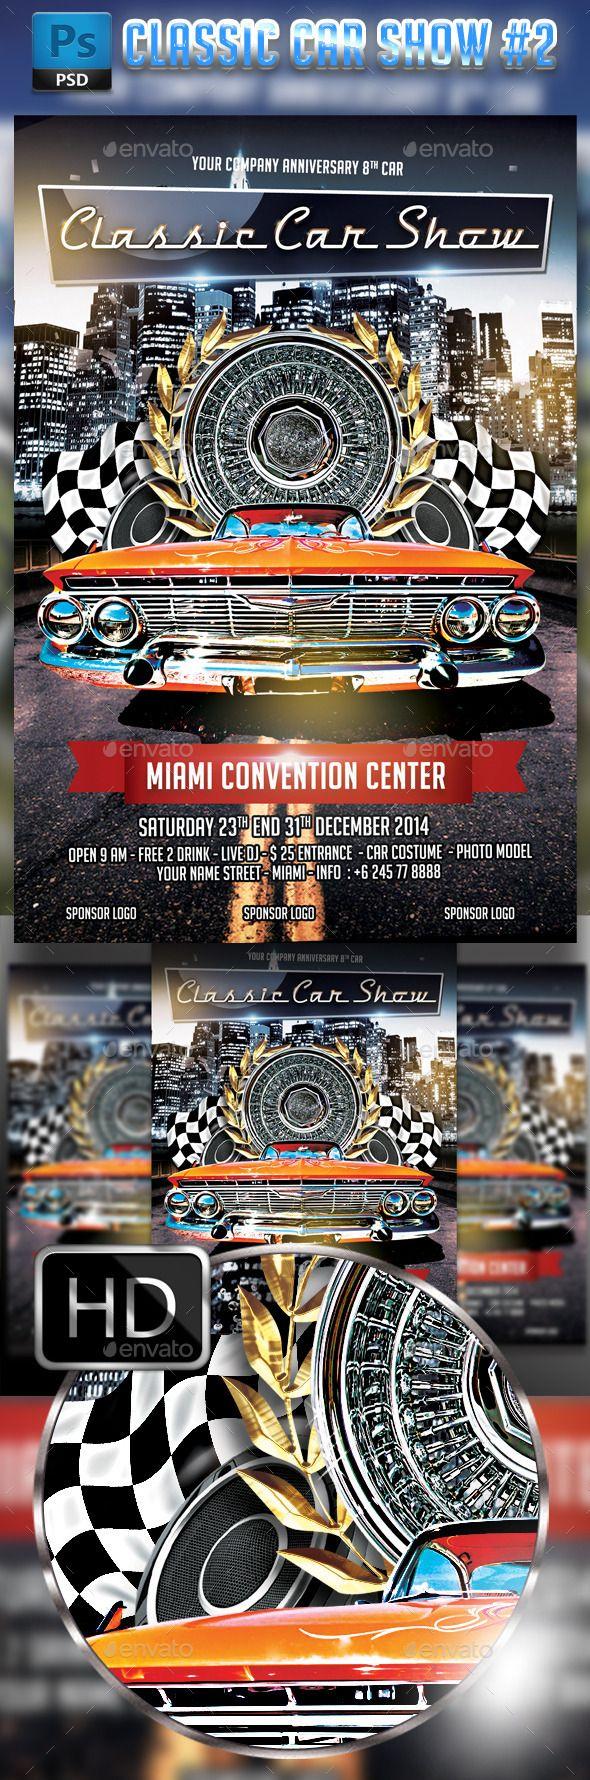 Classic car show flyer 2